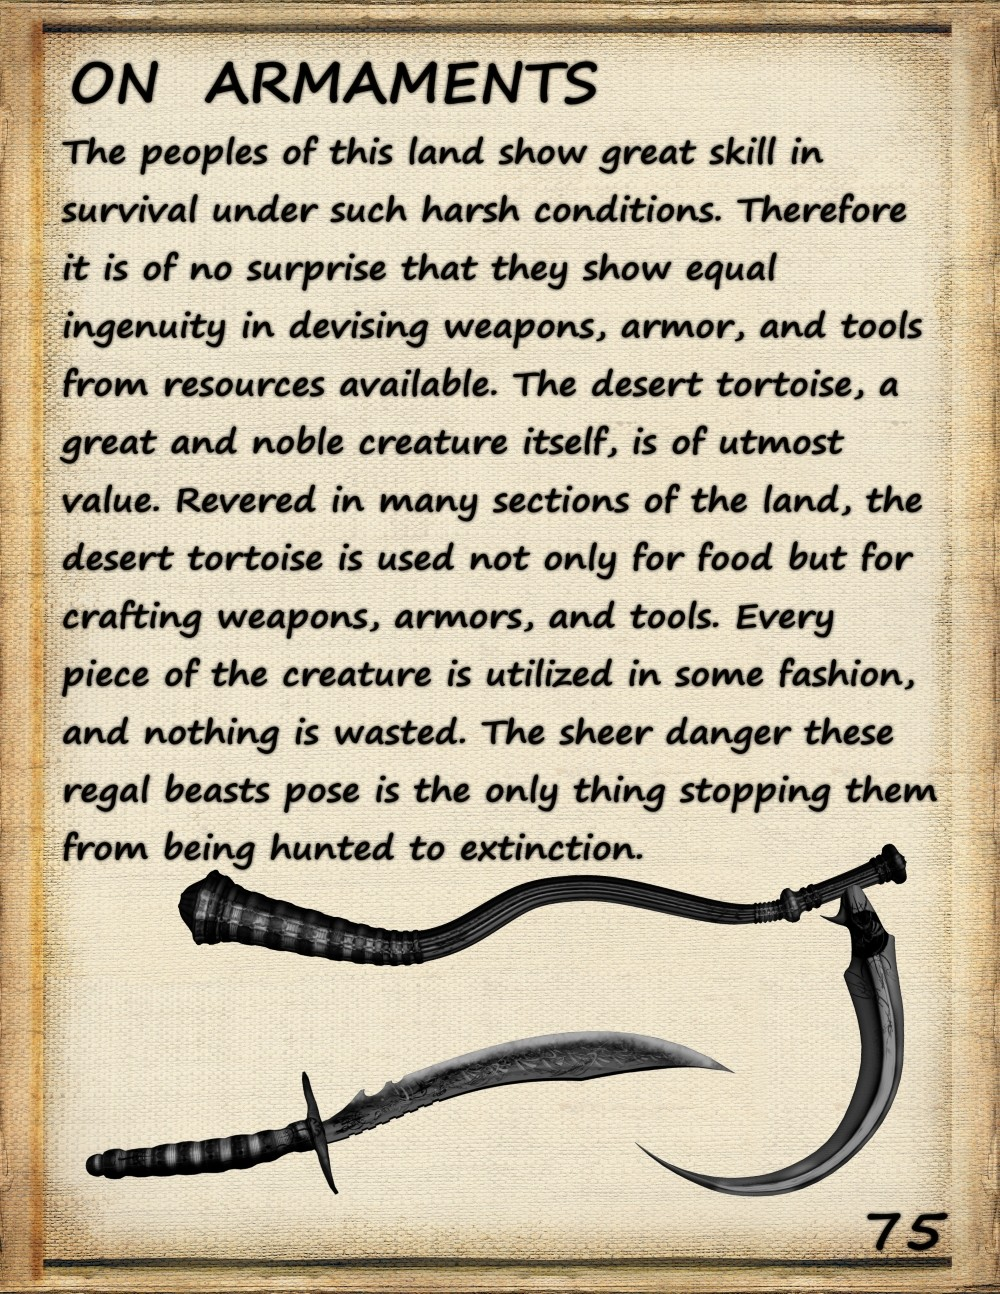 pilgrim's guide armaments